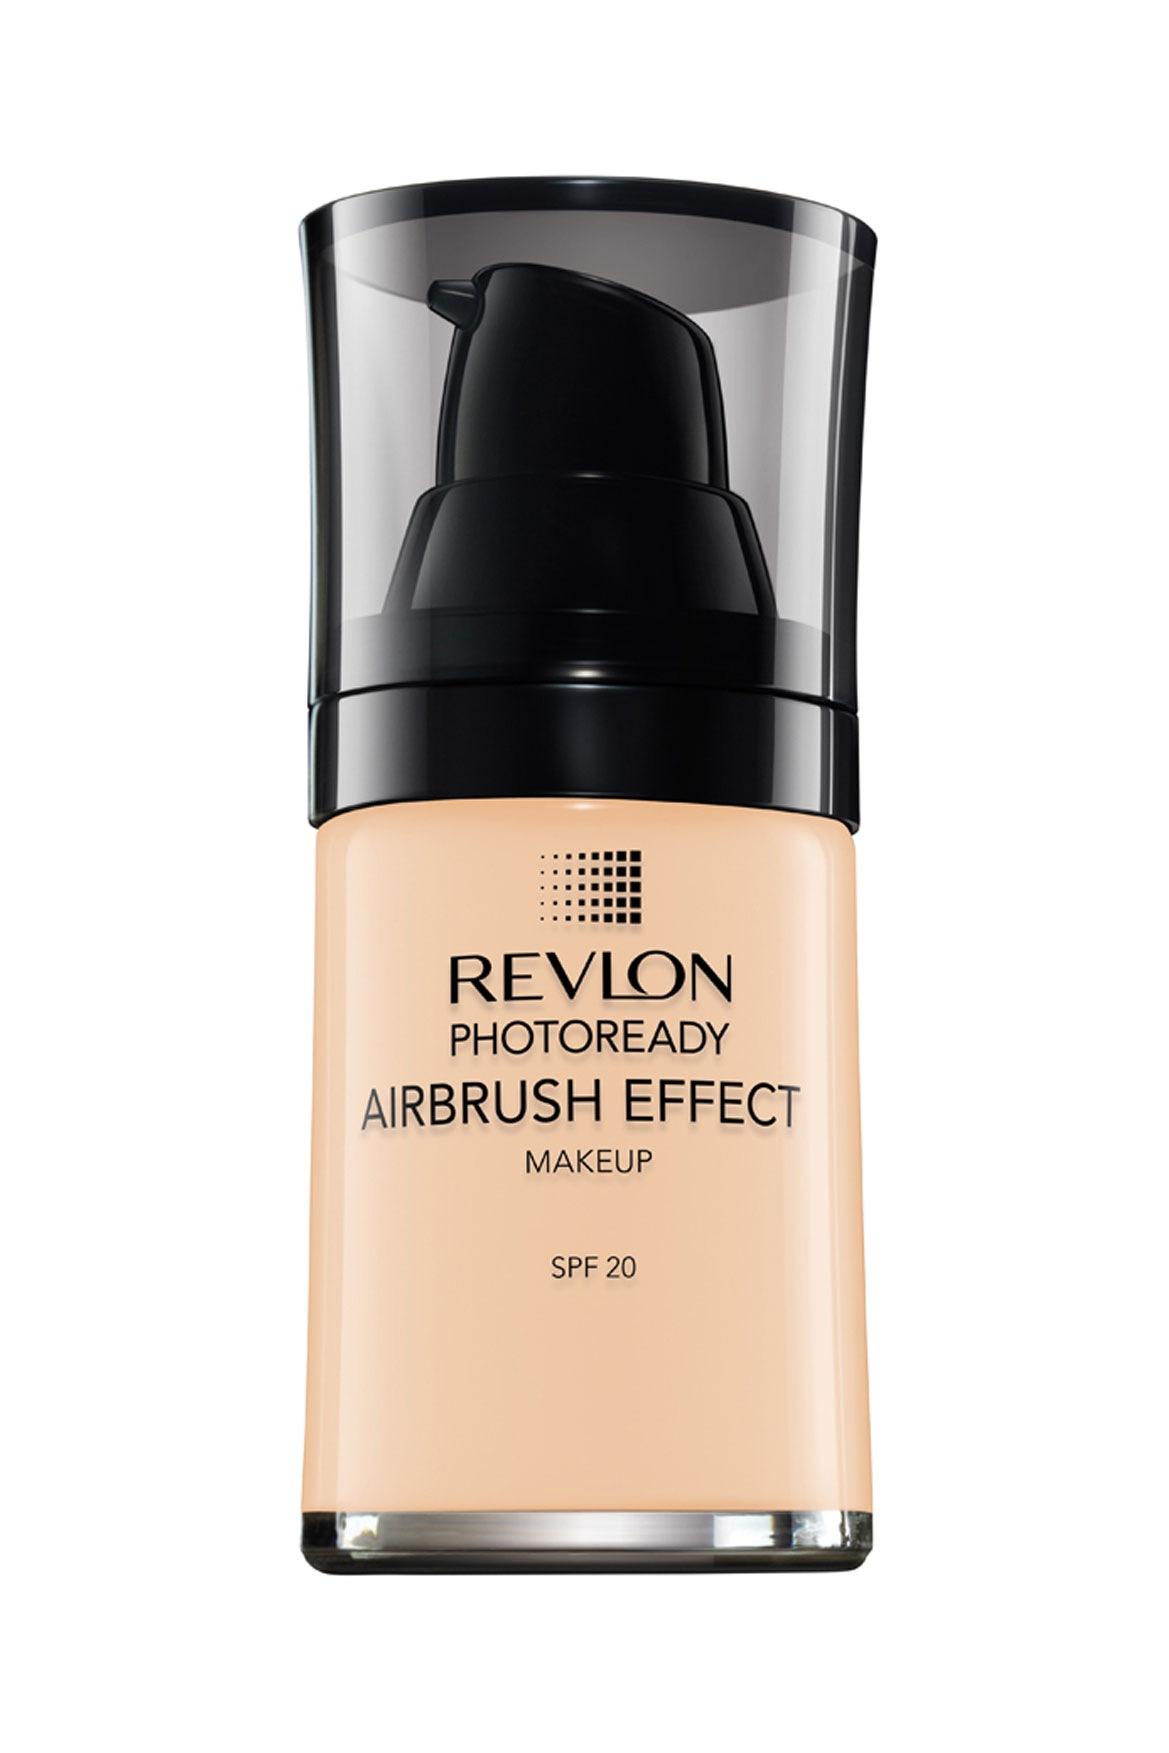 Revlon Photoready Airbrush Effect Makeup Myer Online Insta Filter Ivory